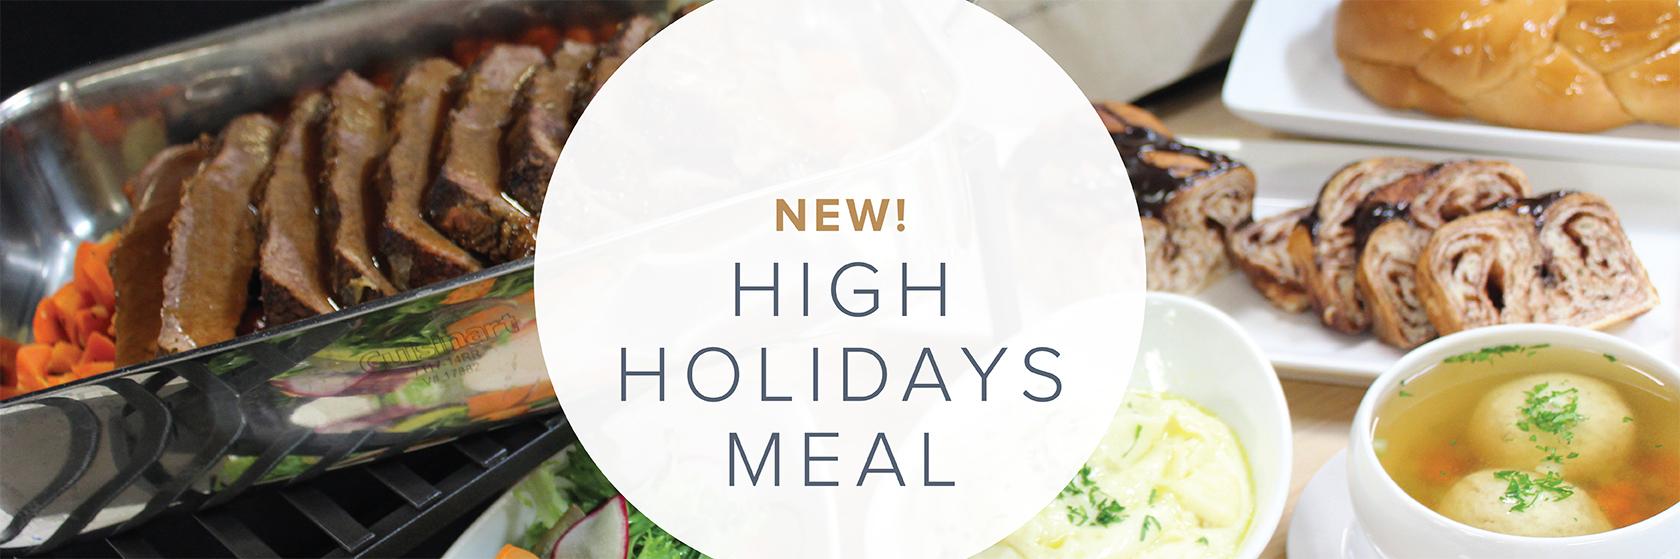 High Holidays Meal